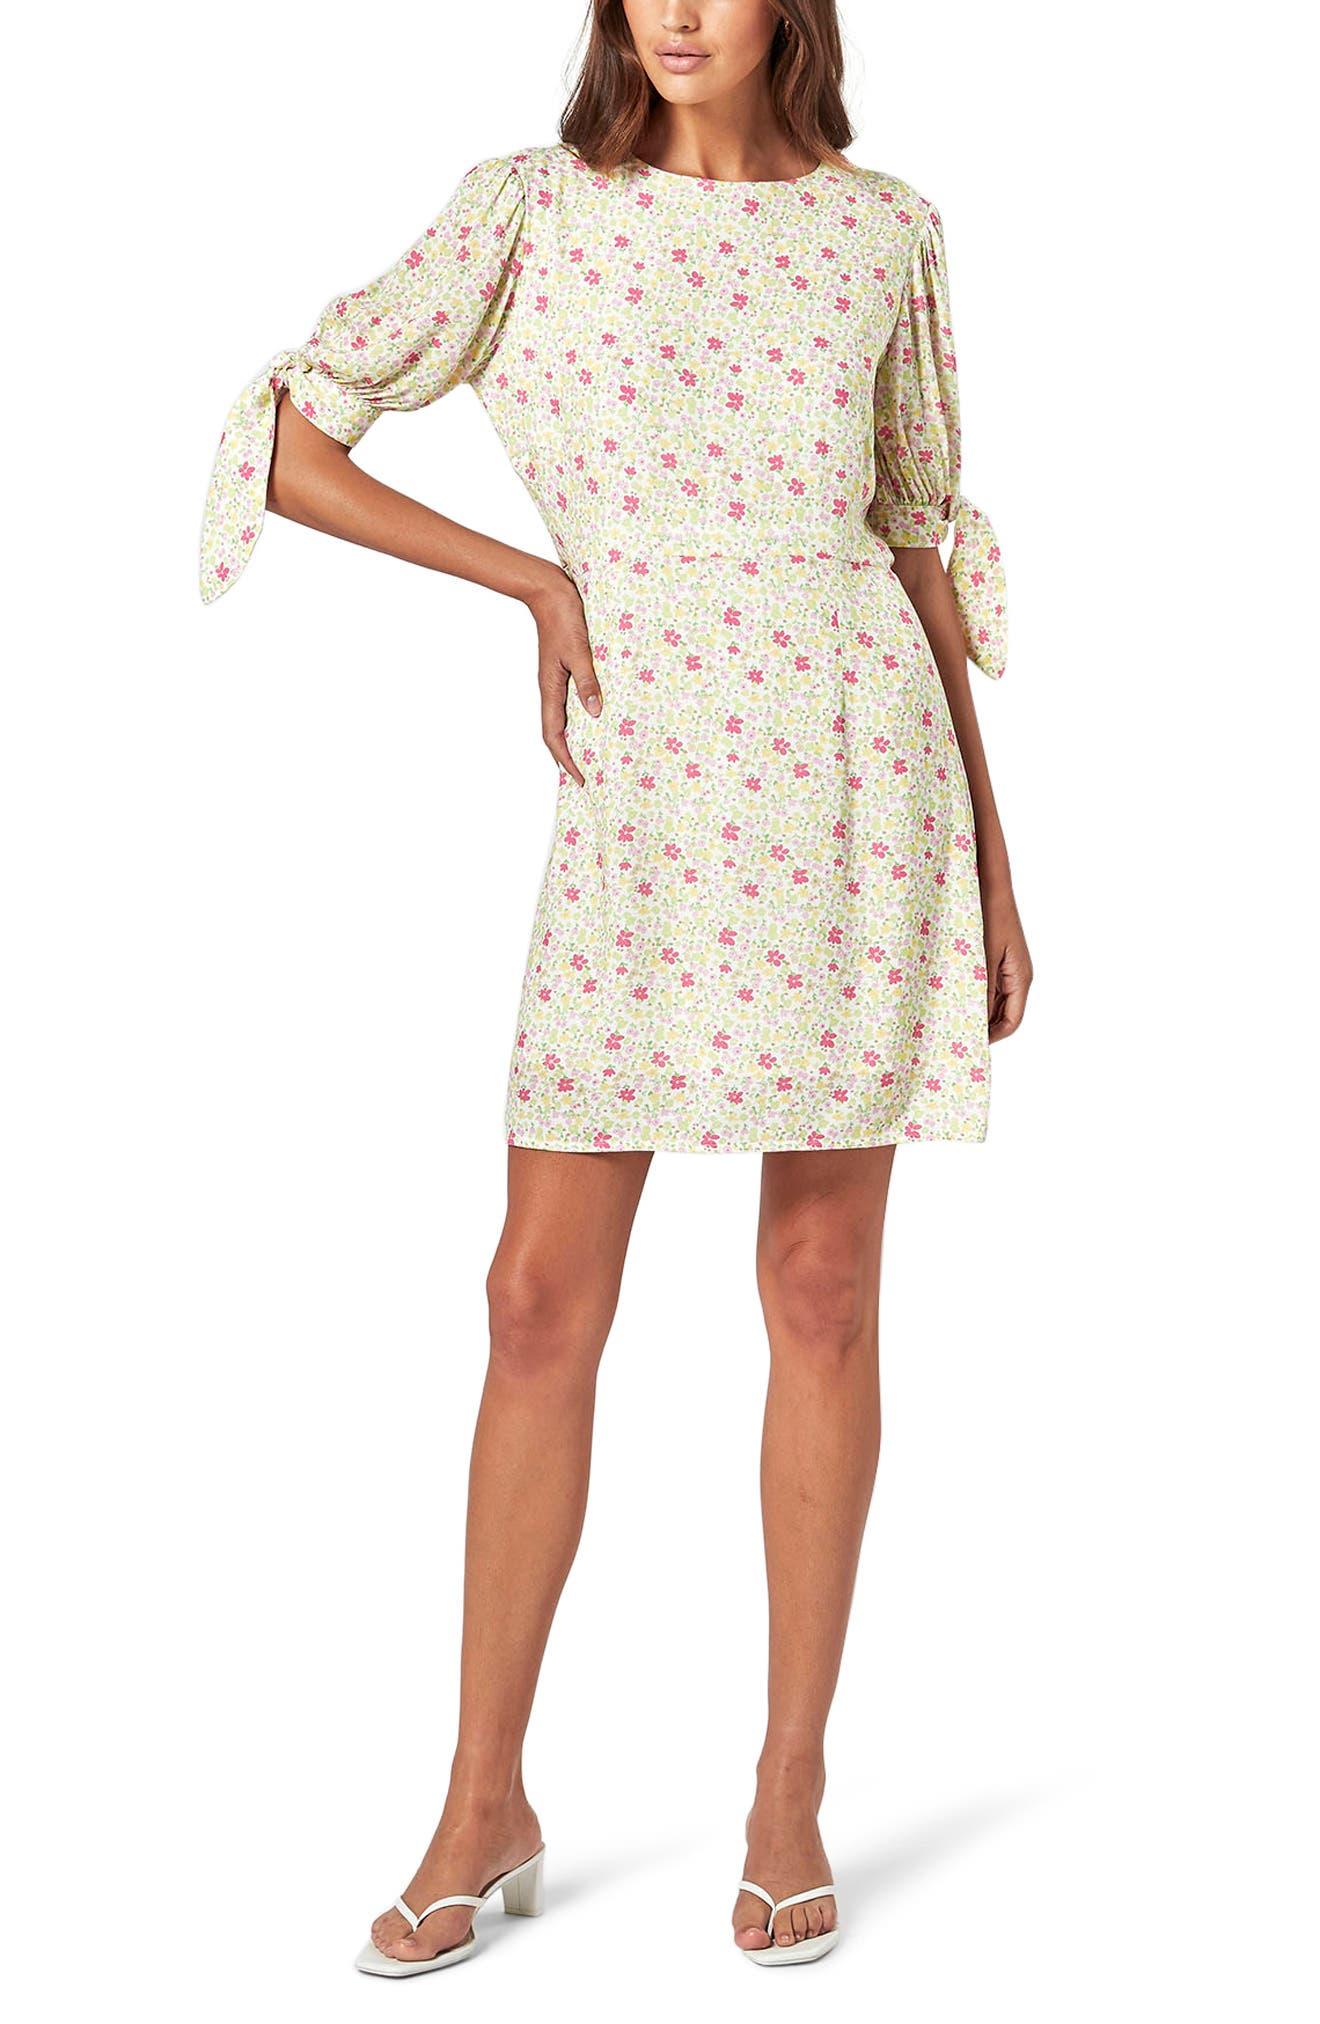 Bayside Floral Minidress